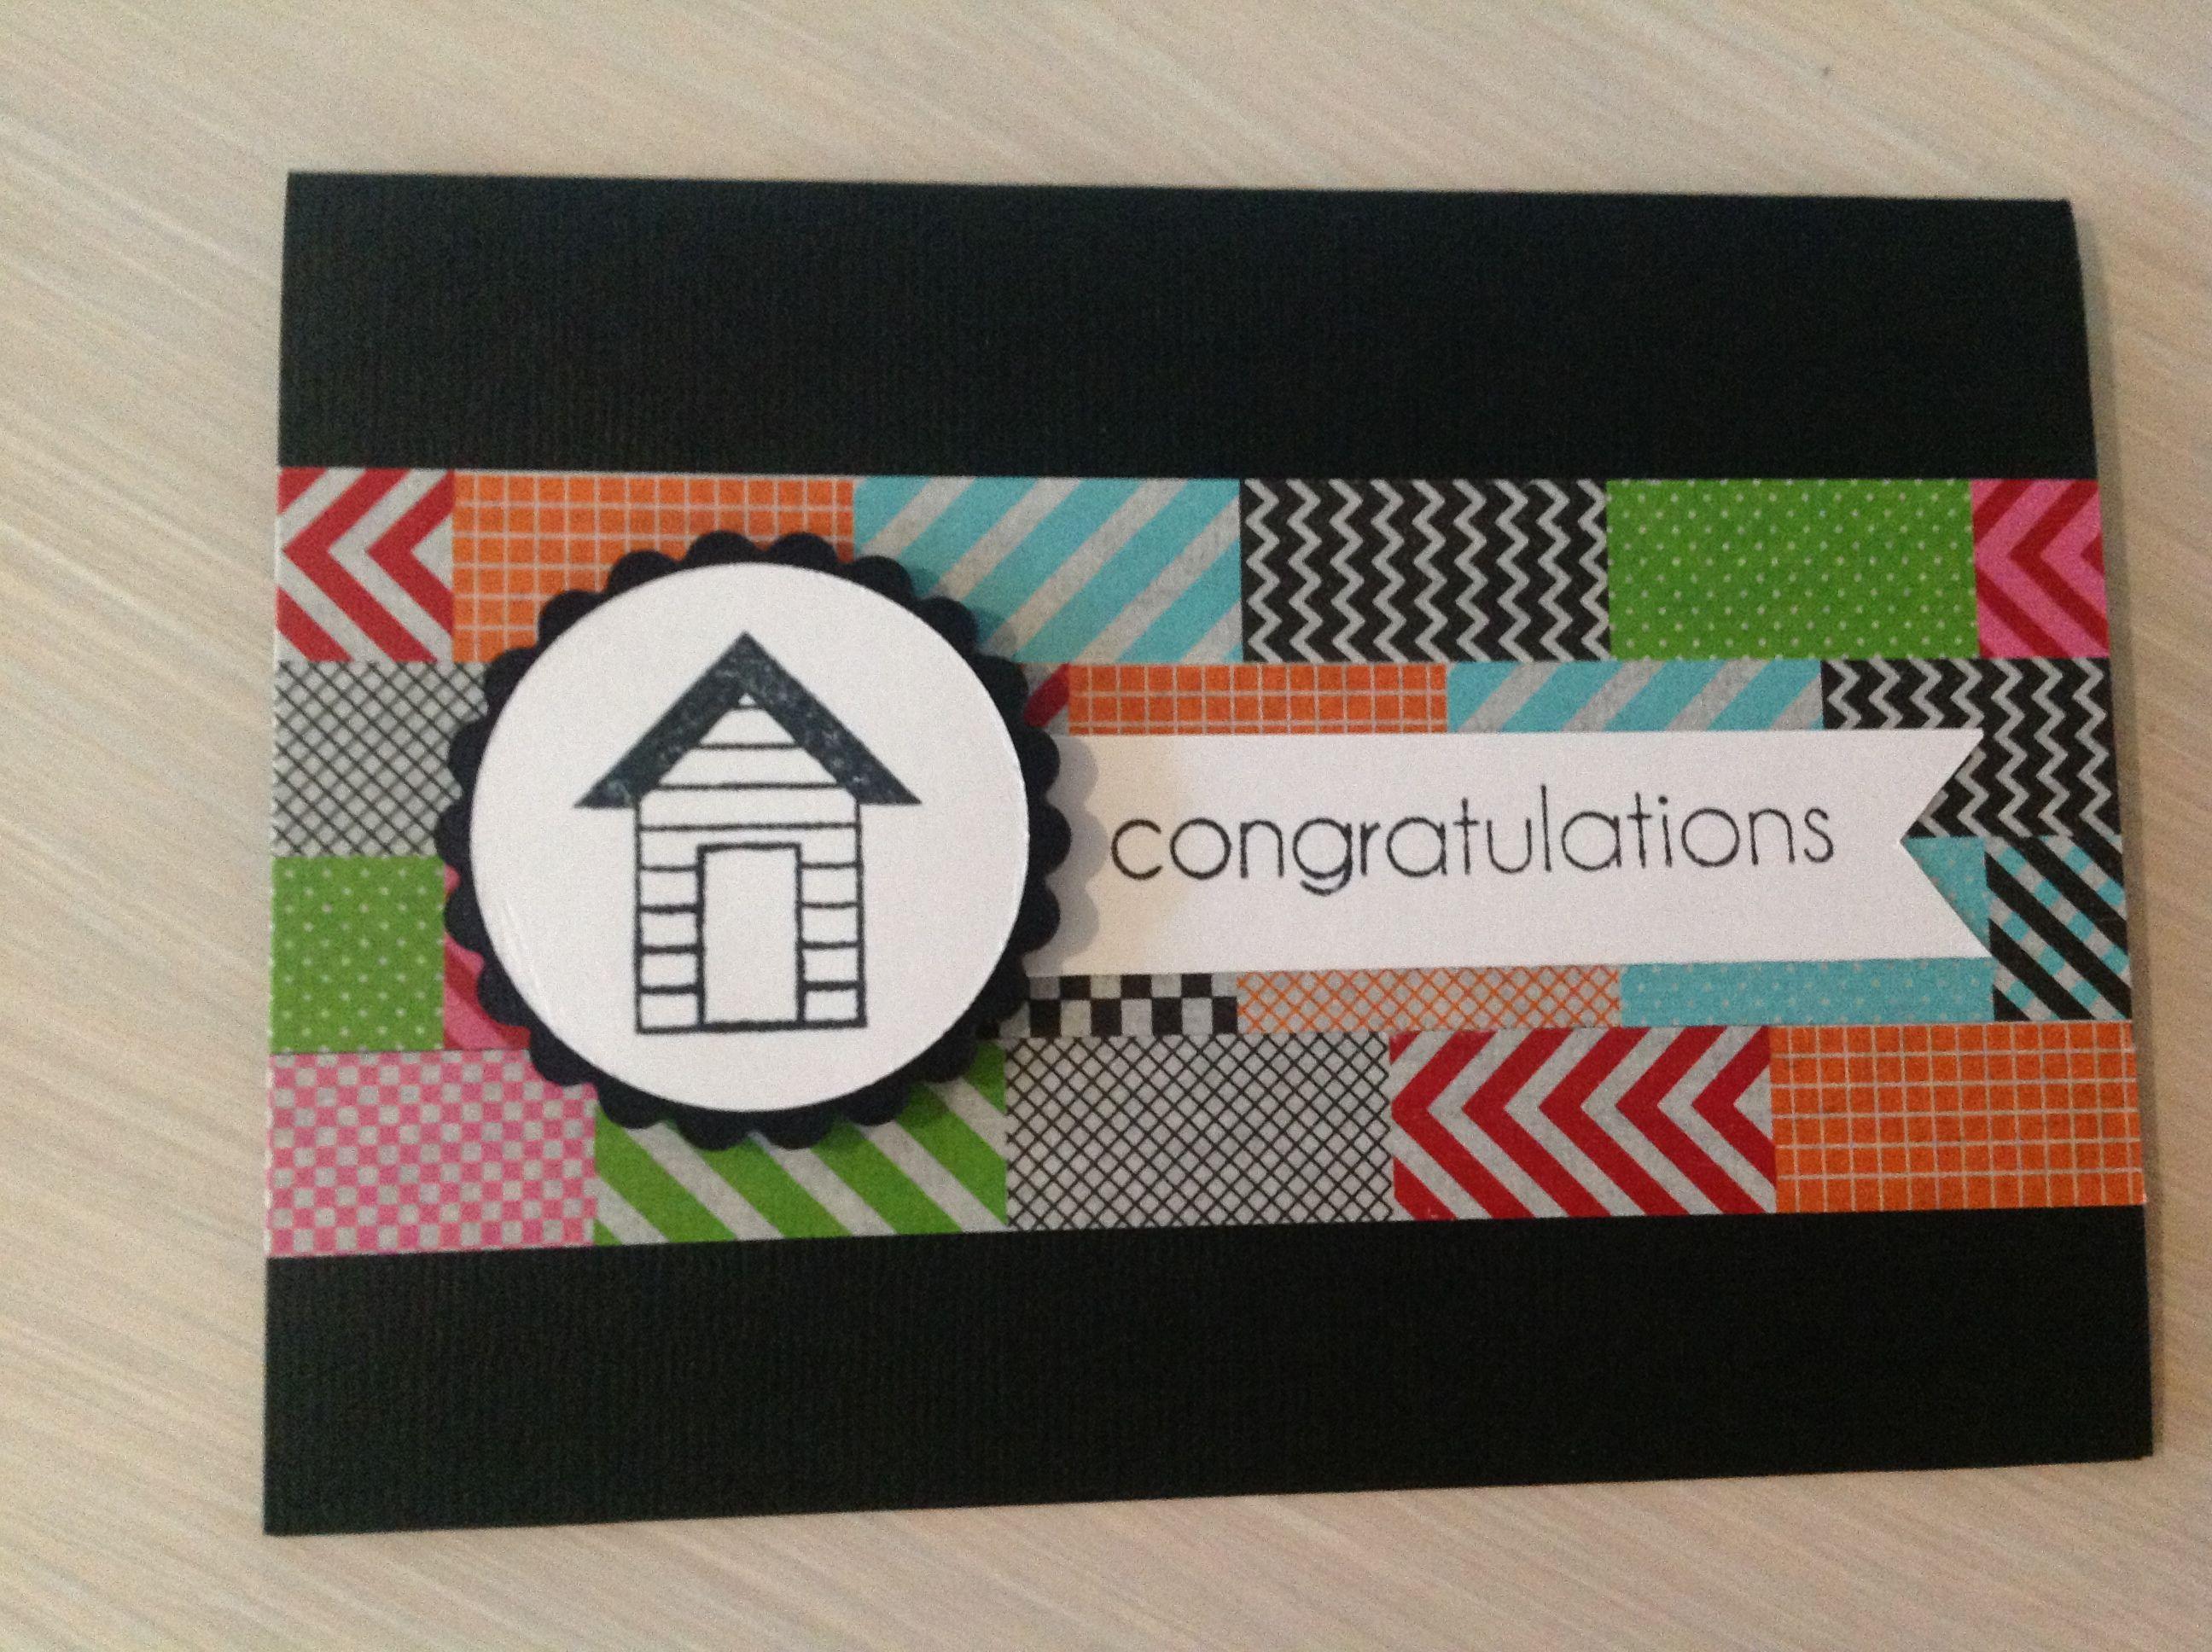 Card Making Ideas For Housewarming Part - 43: Housewarming Card · Diy PresentsHousewarming ...